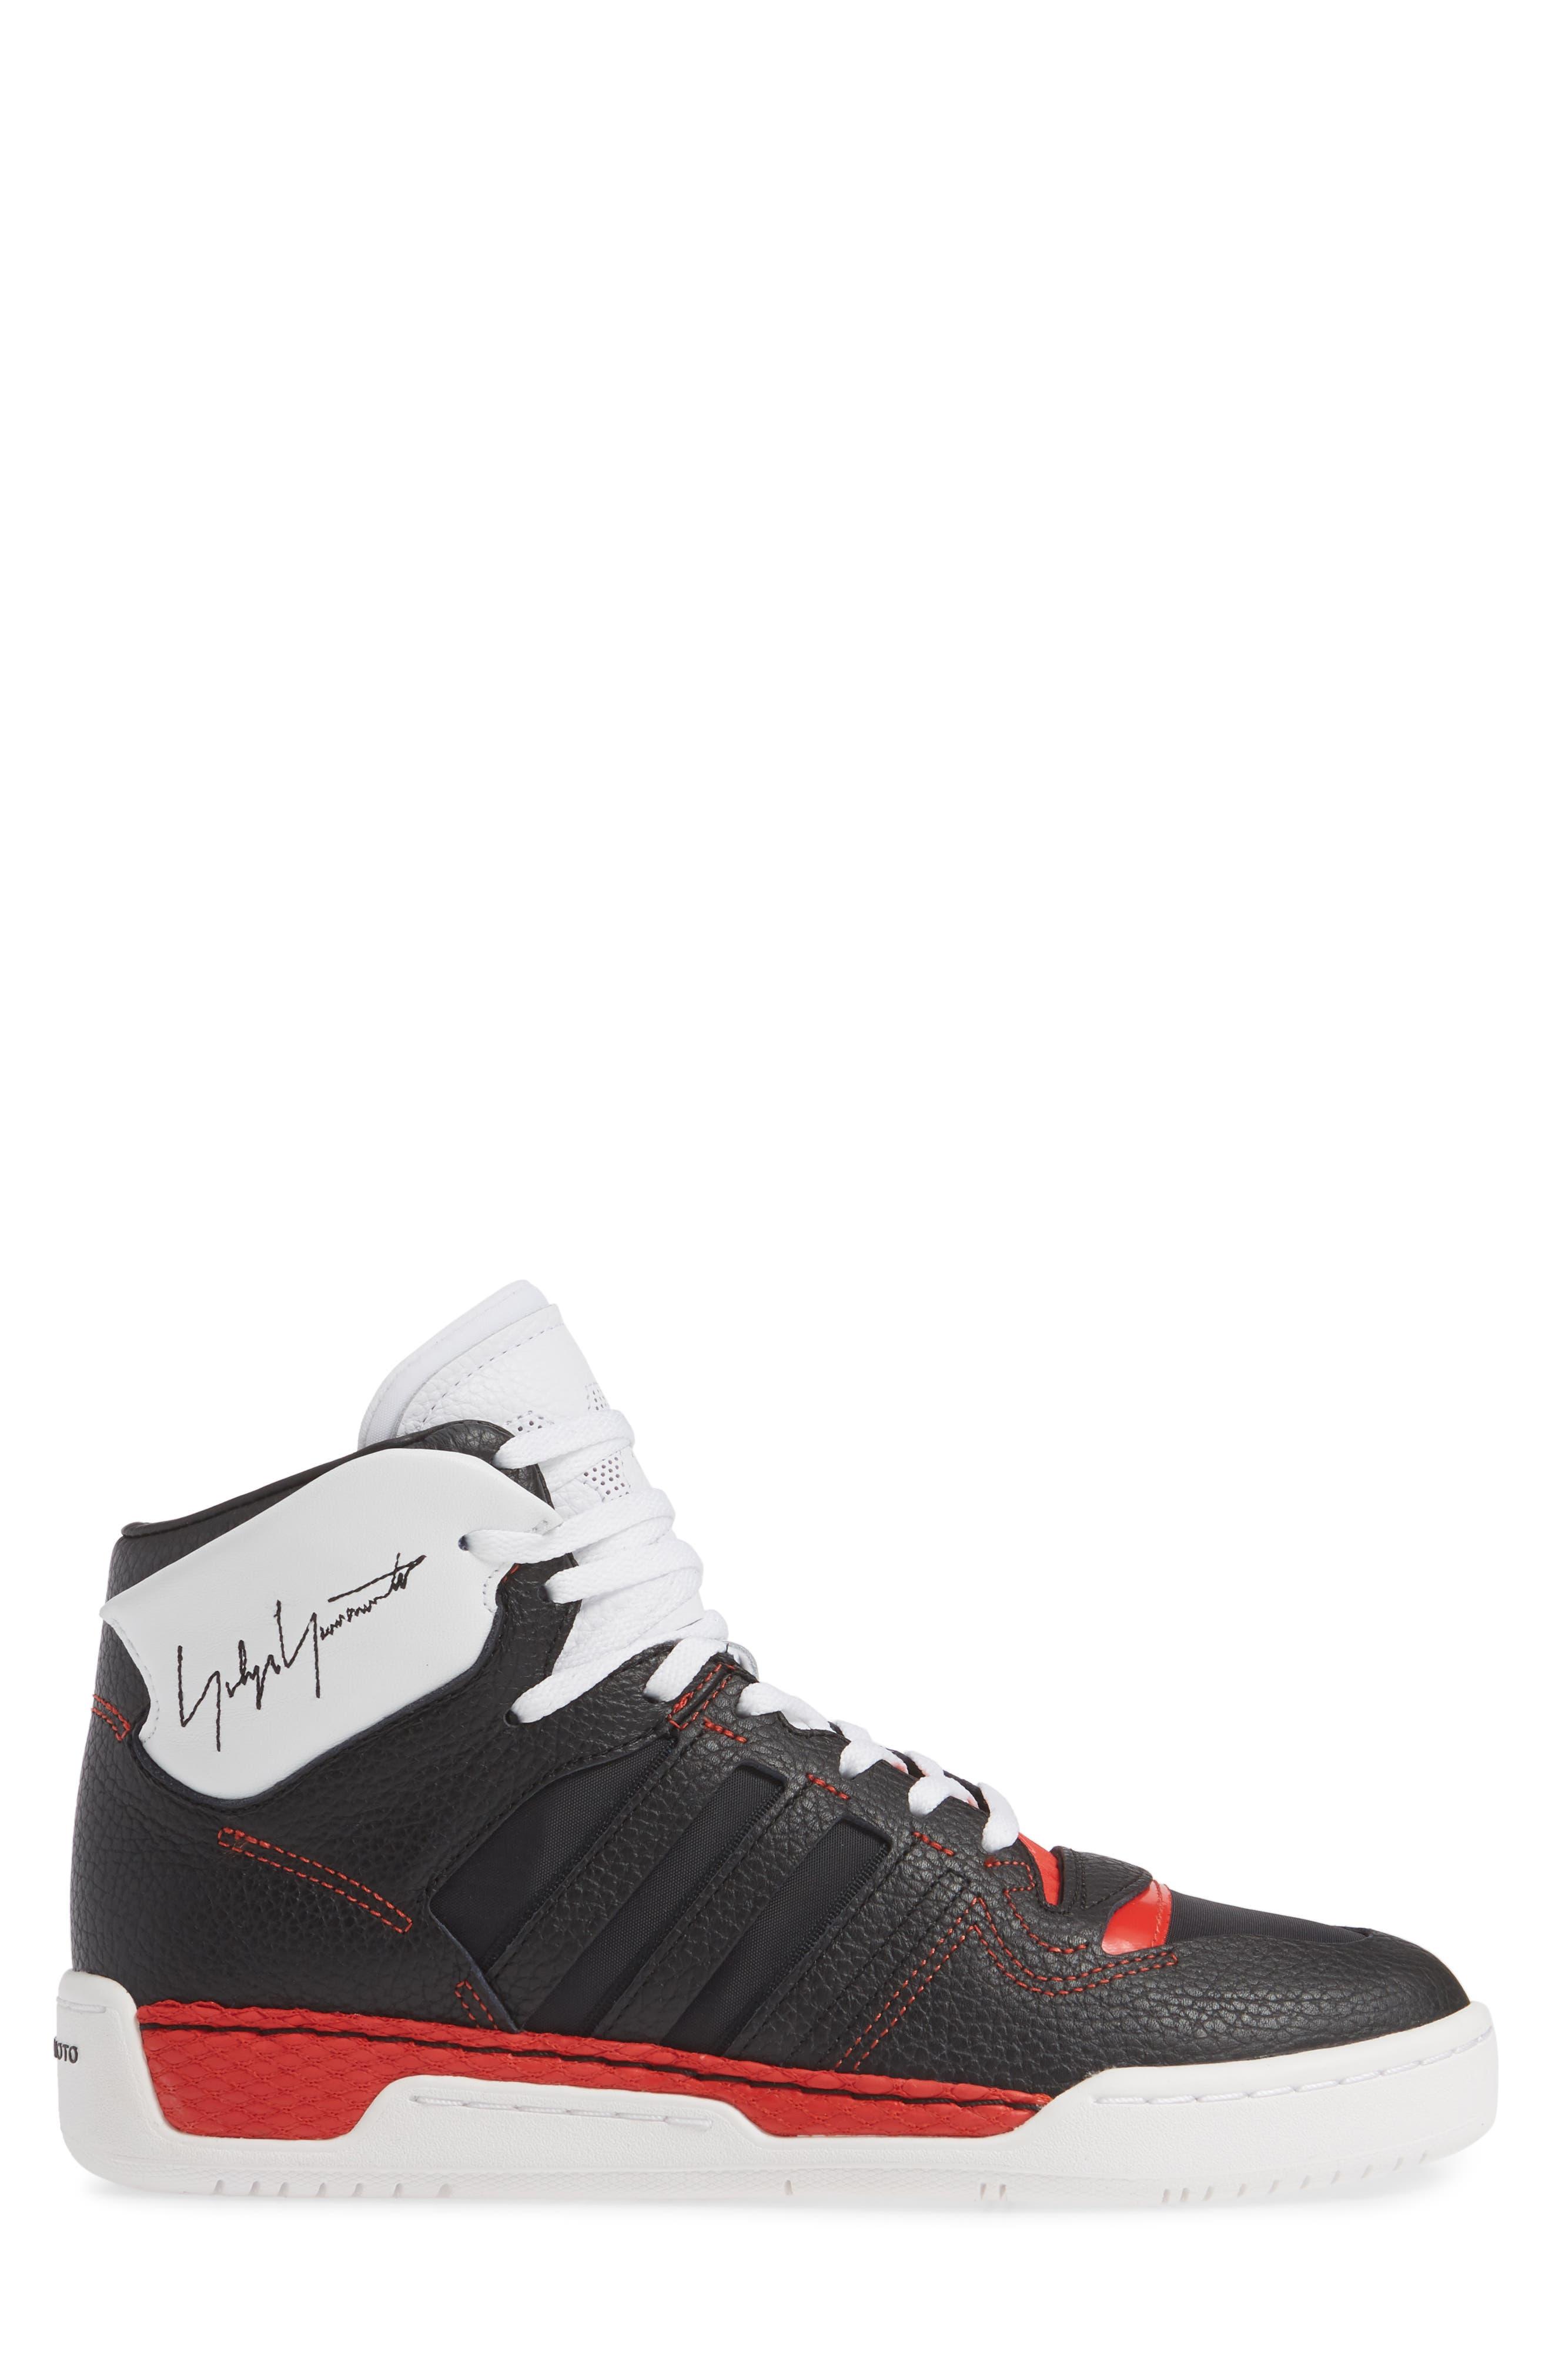 Y-3,                             x adidas Hayworth High Top Sneaker,                             Alternate thumbnail 3, color,                             BLACK/ BLACK/ RED